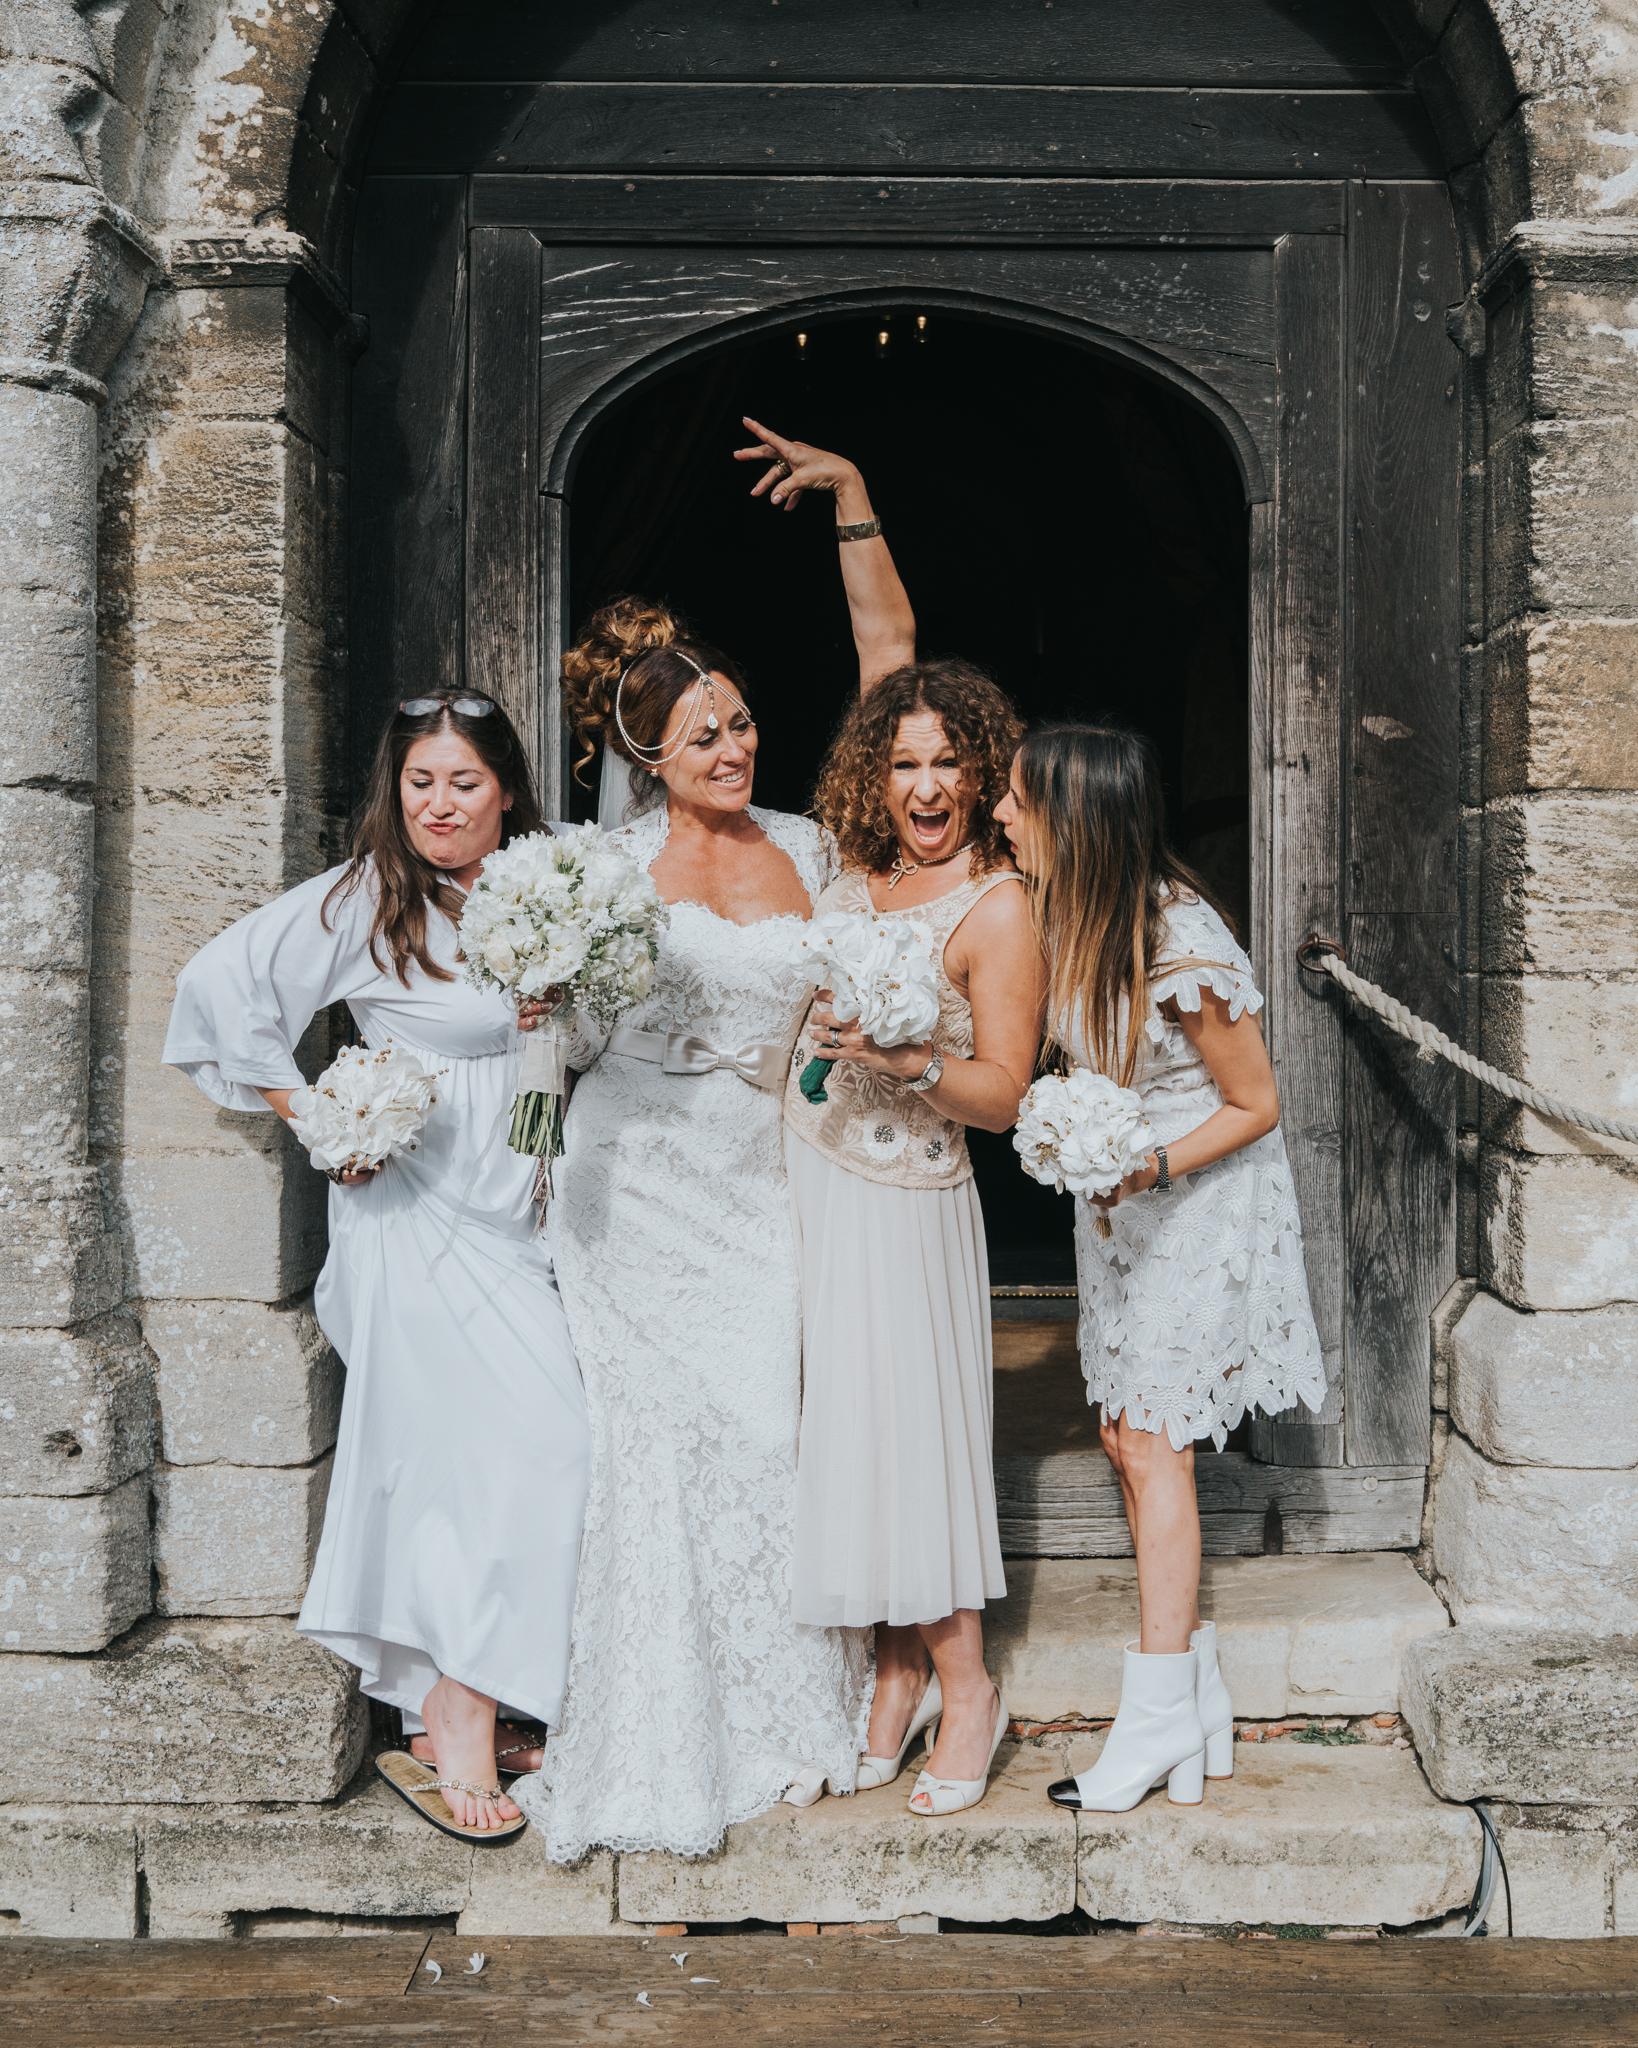 Wedding+2017+-+2018+(13+of+17).jpg